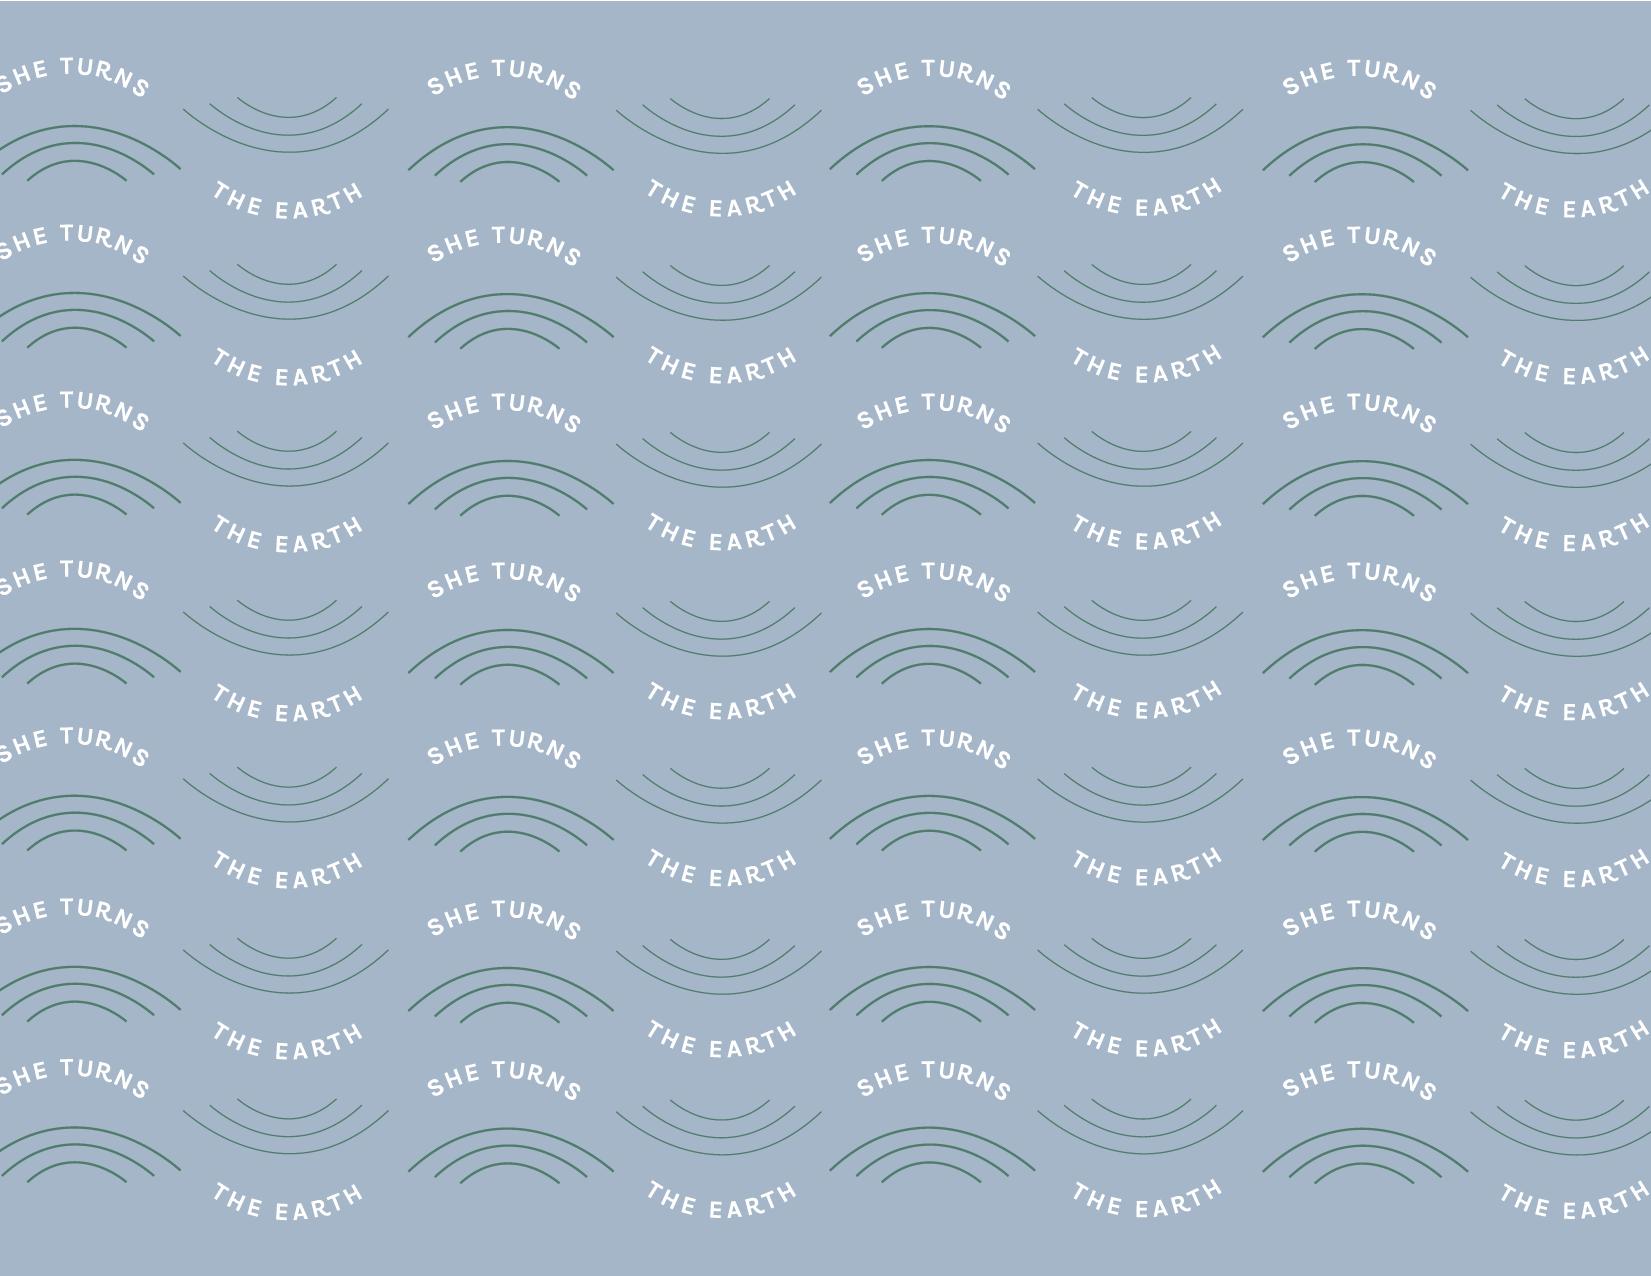 SheTurns-Pattern.png